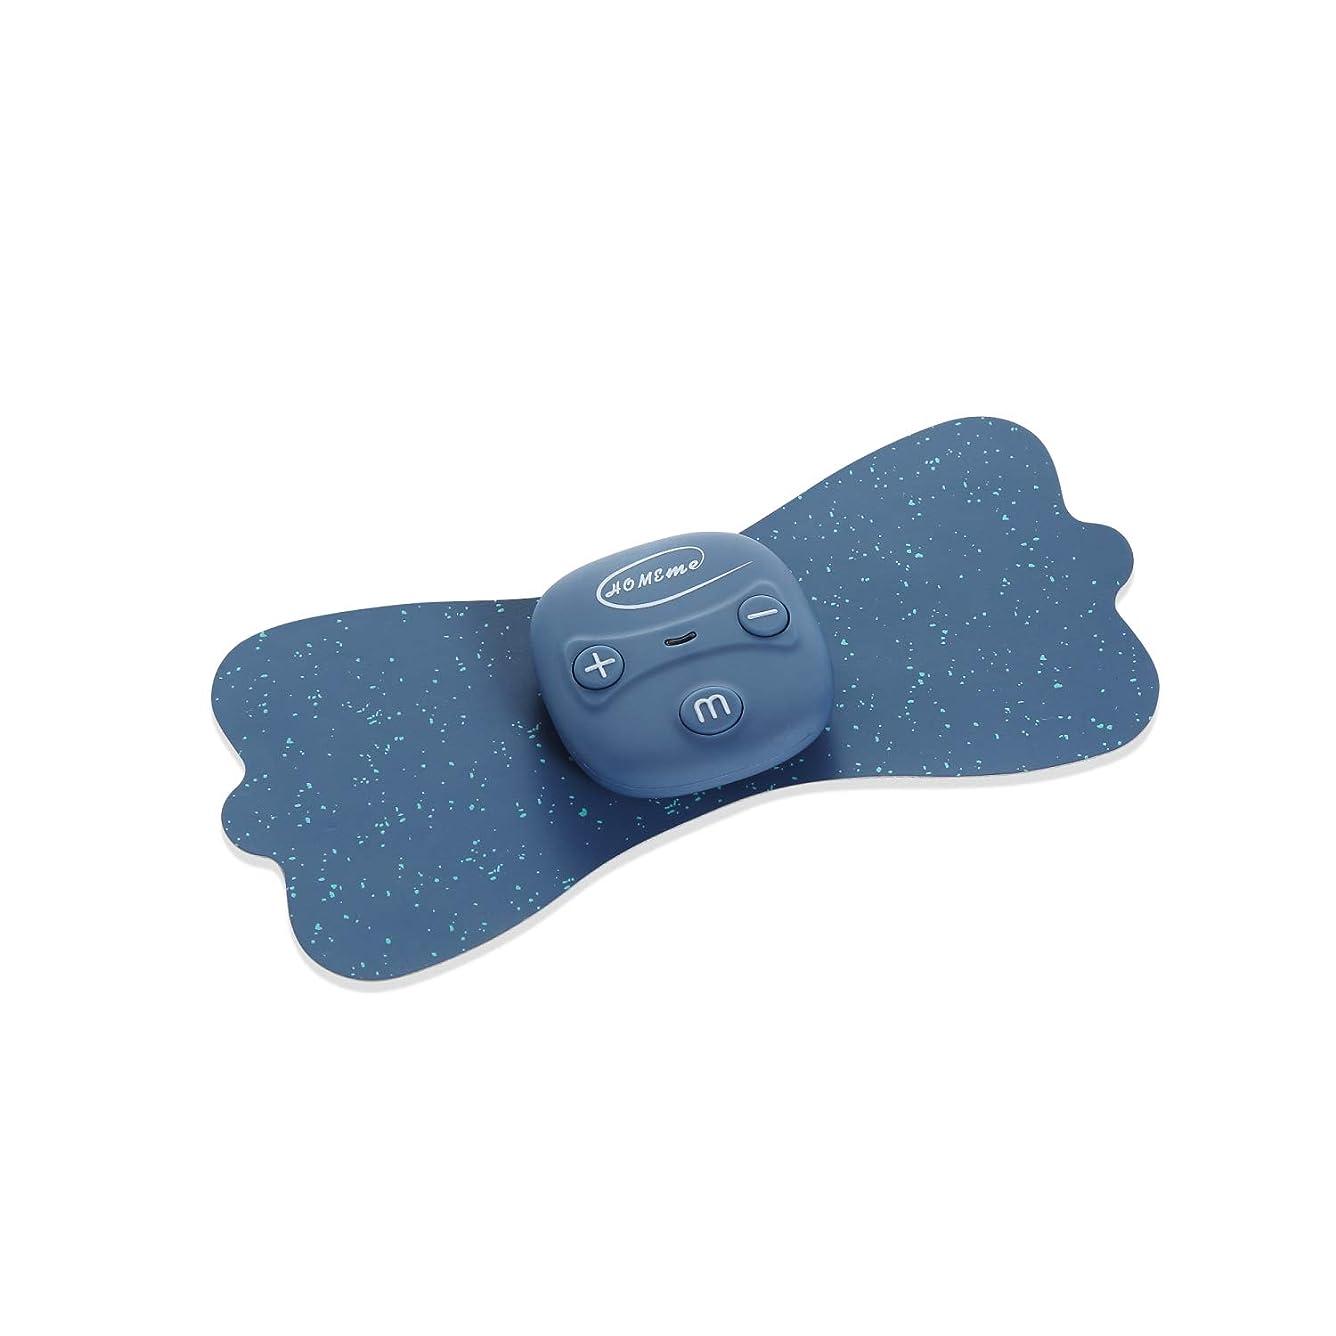 HOMEME 低周波マッサージパッド 2枚 EMSパッド 15段階調節 6つモード 腰マッサージ usb充電式 筋疲労回復 一年保証 首/肩/腰/背中/手/足向け